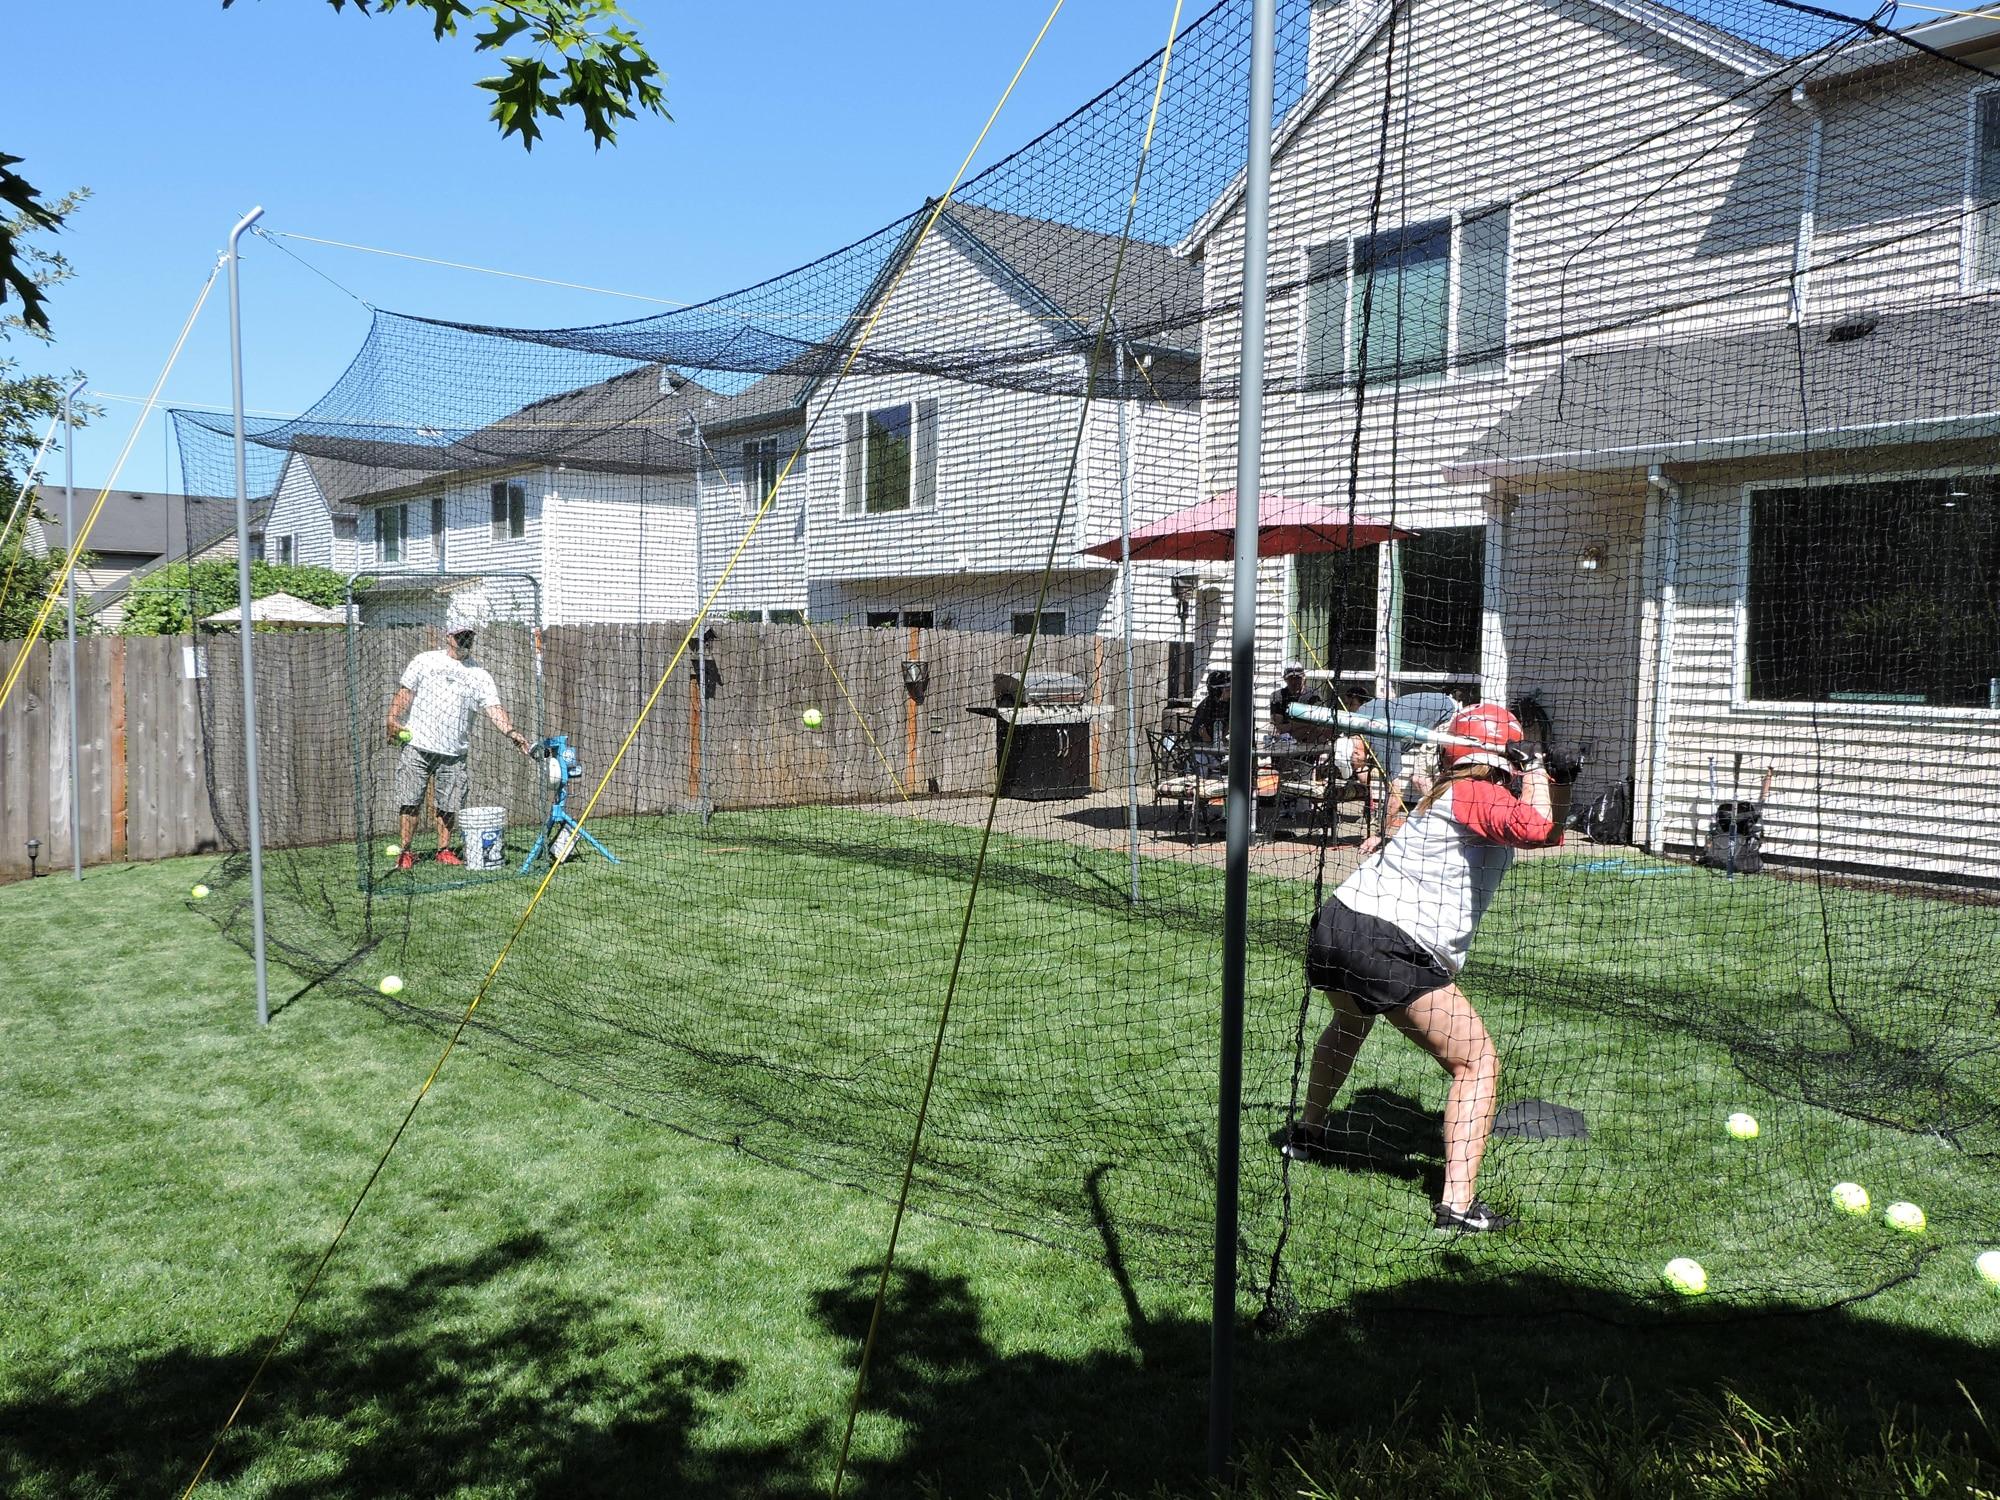 Portable Batting Cages - JUGS Hit at Home Backyard Bating Cage